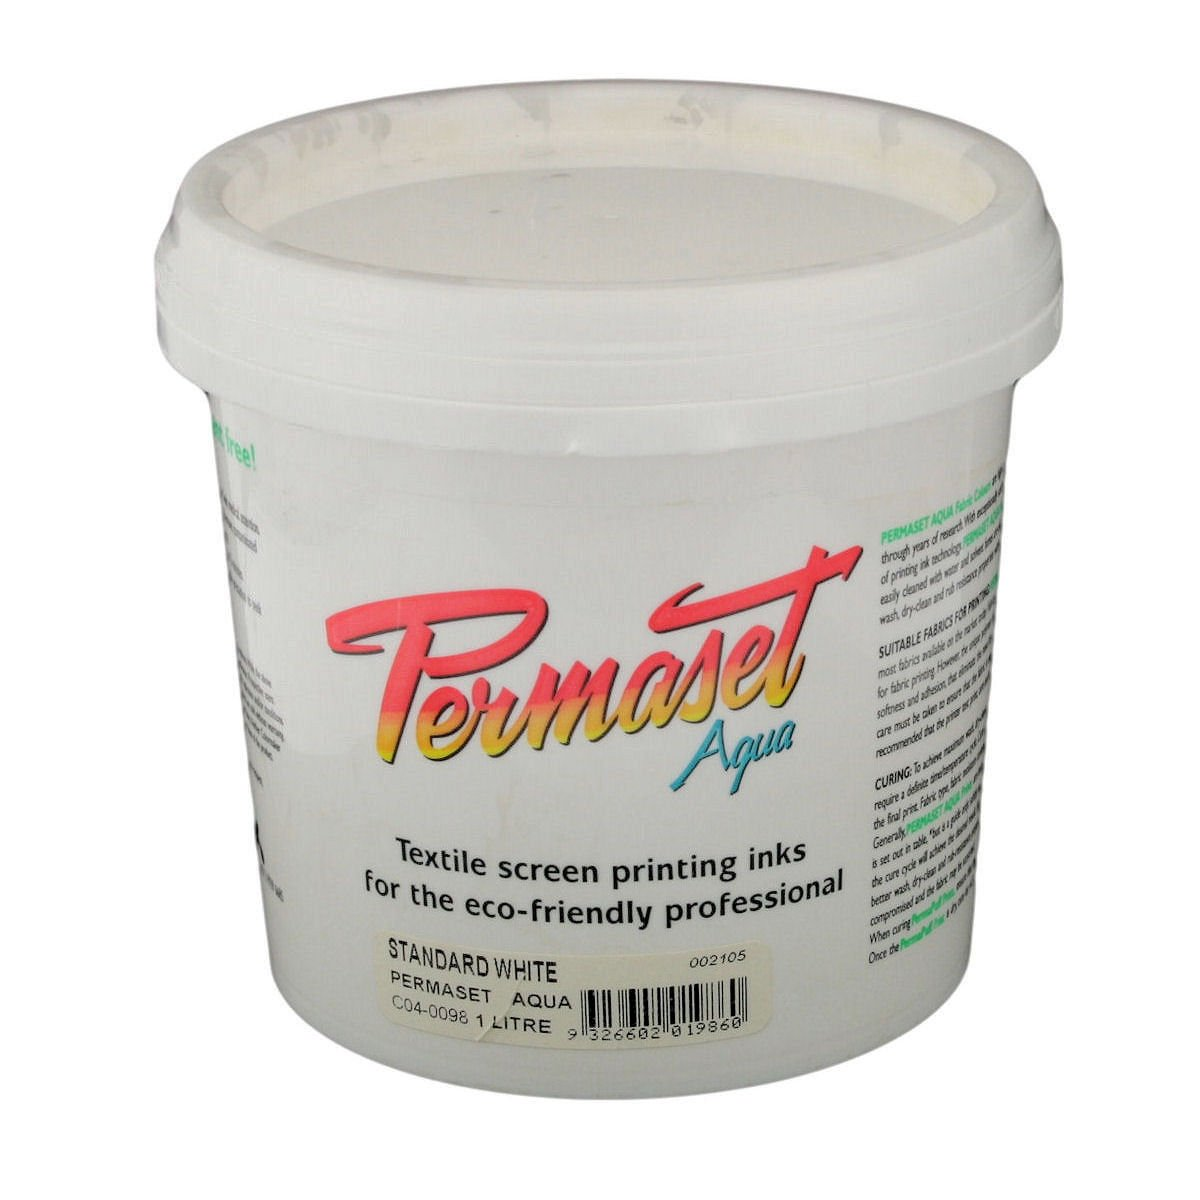 Permaset Aqua 1 Litre Fabric Printing Ink - Standard White Colormaker SR002105